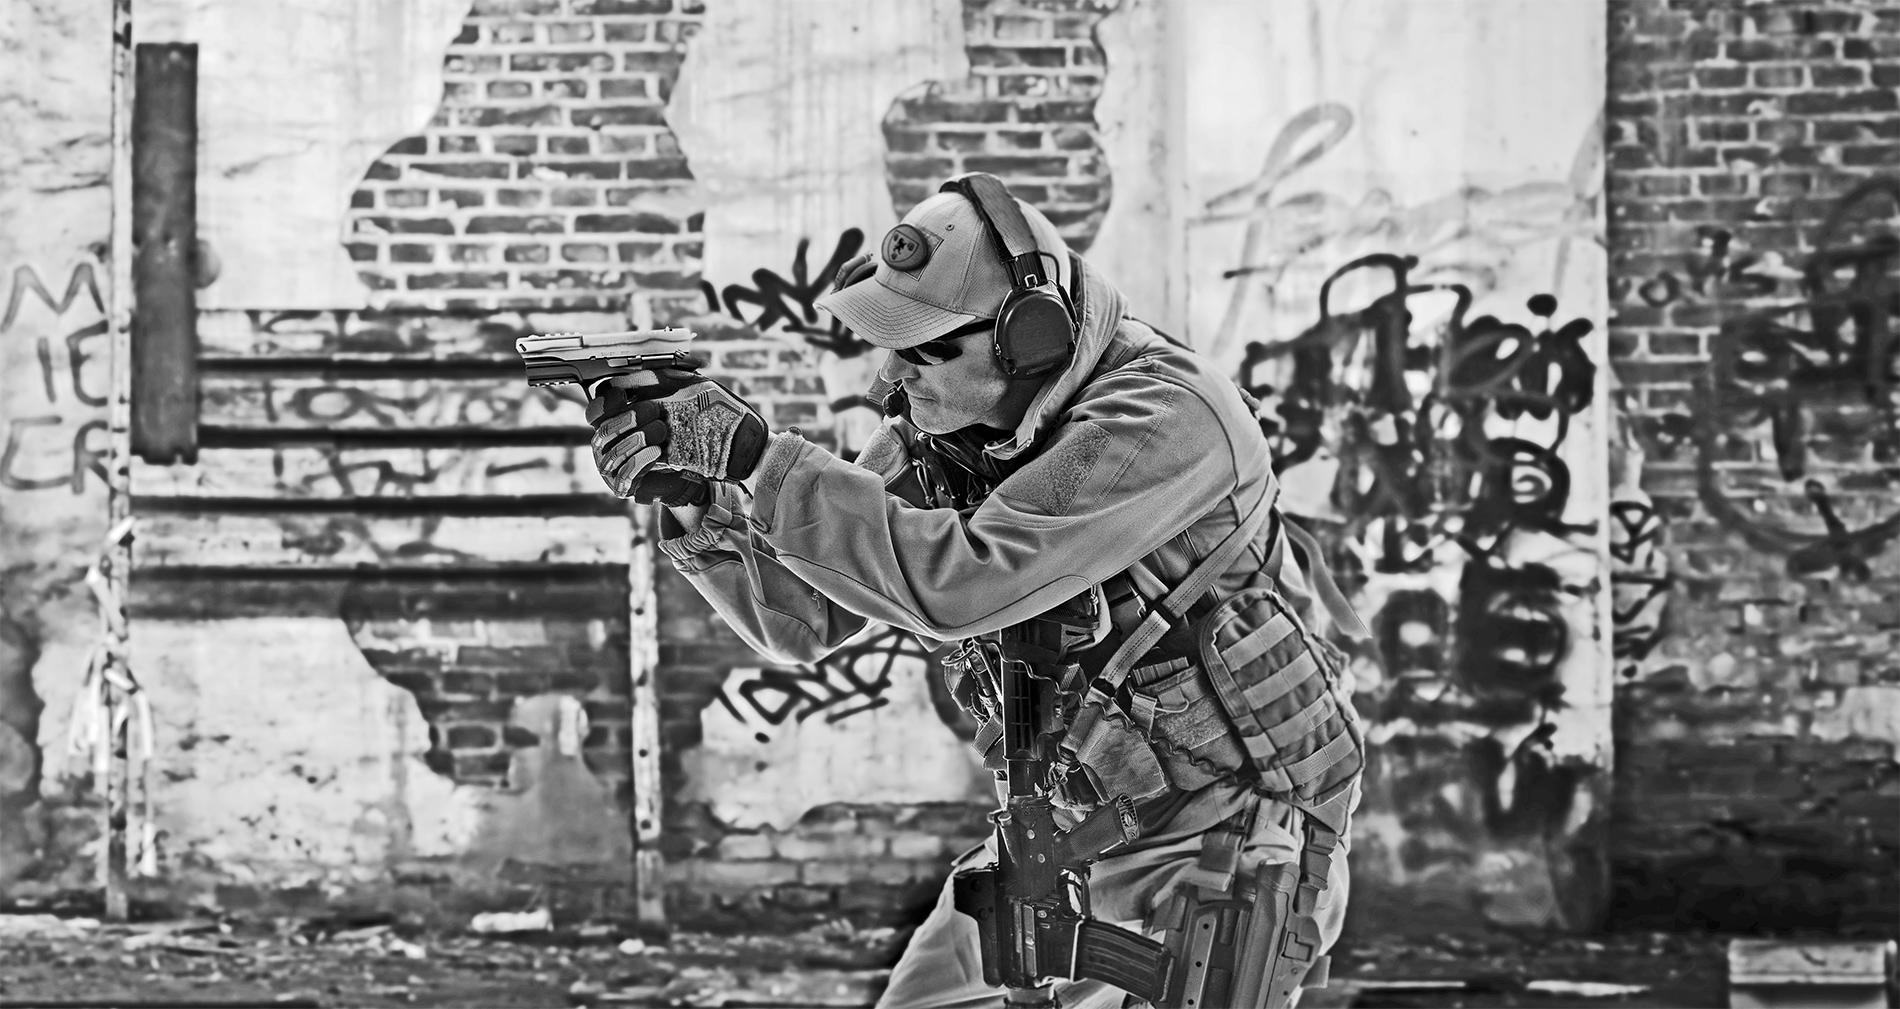 ca-19-shooter-urban-web.jpg